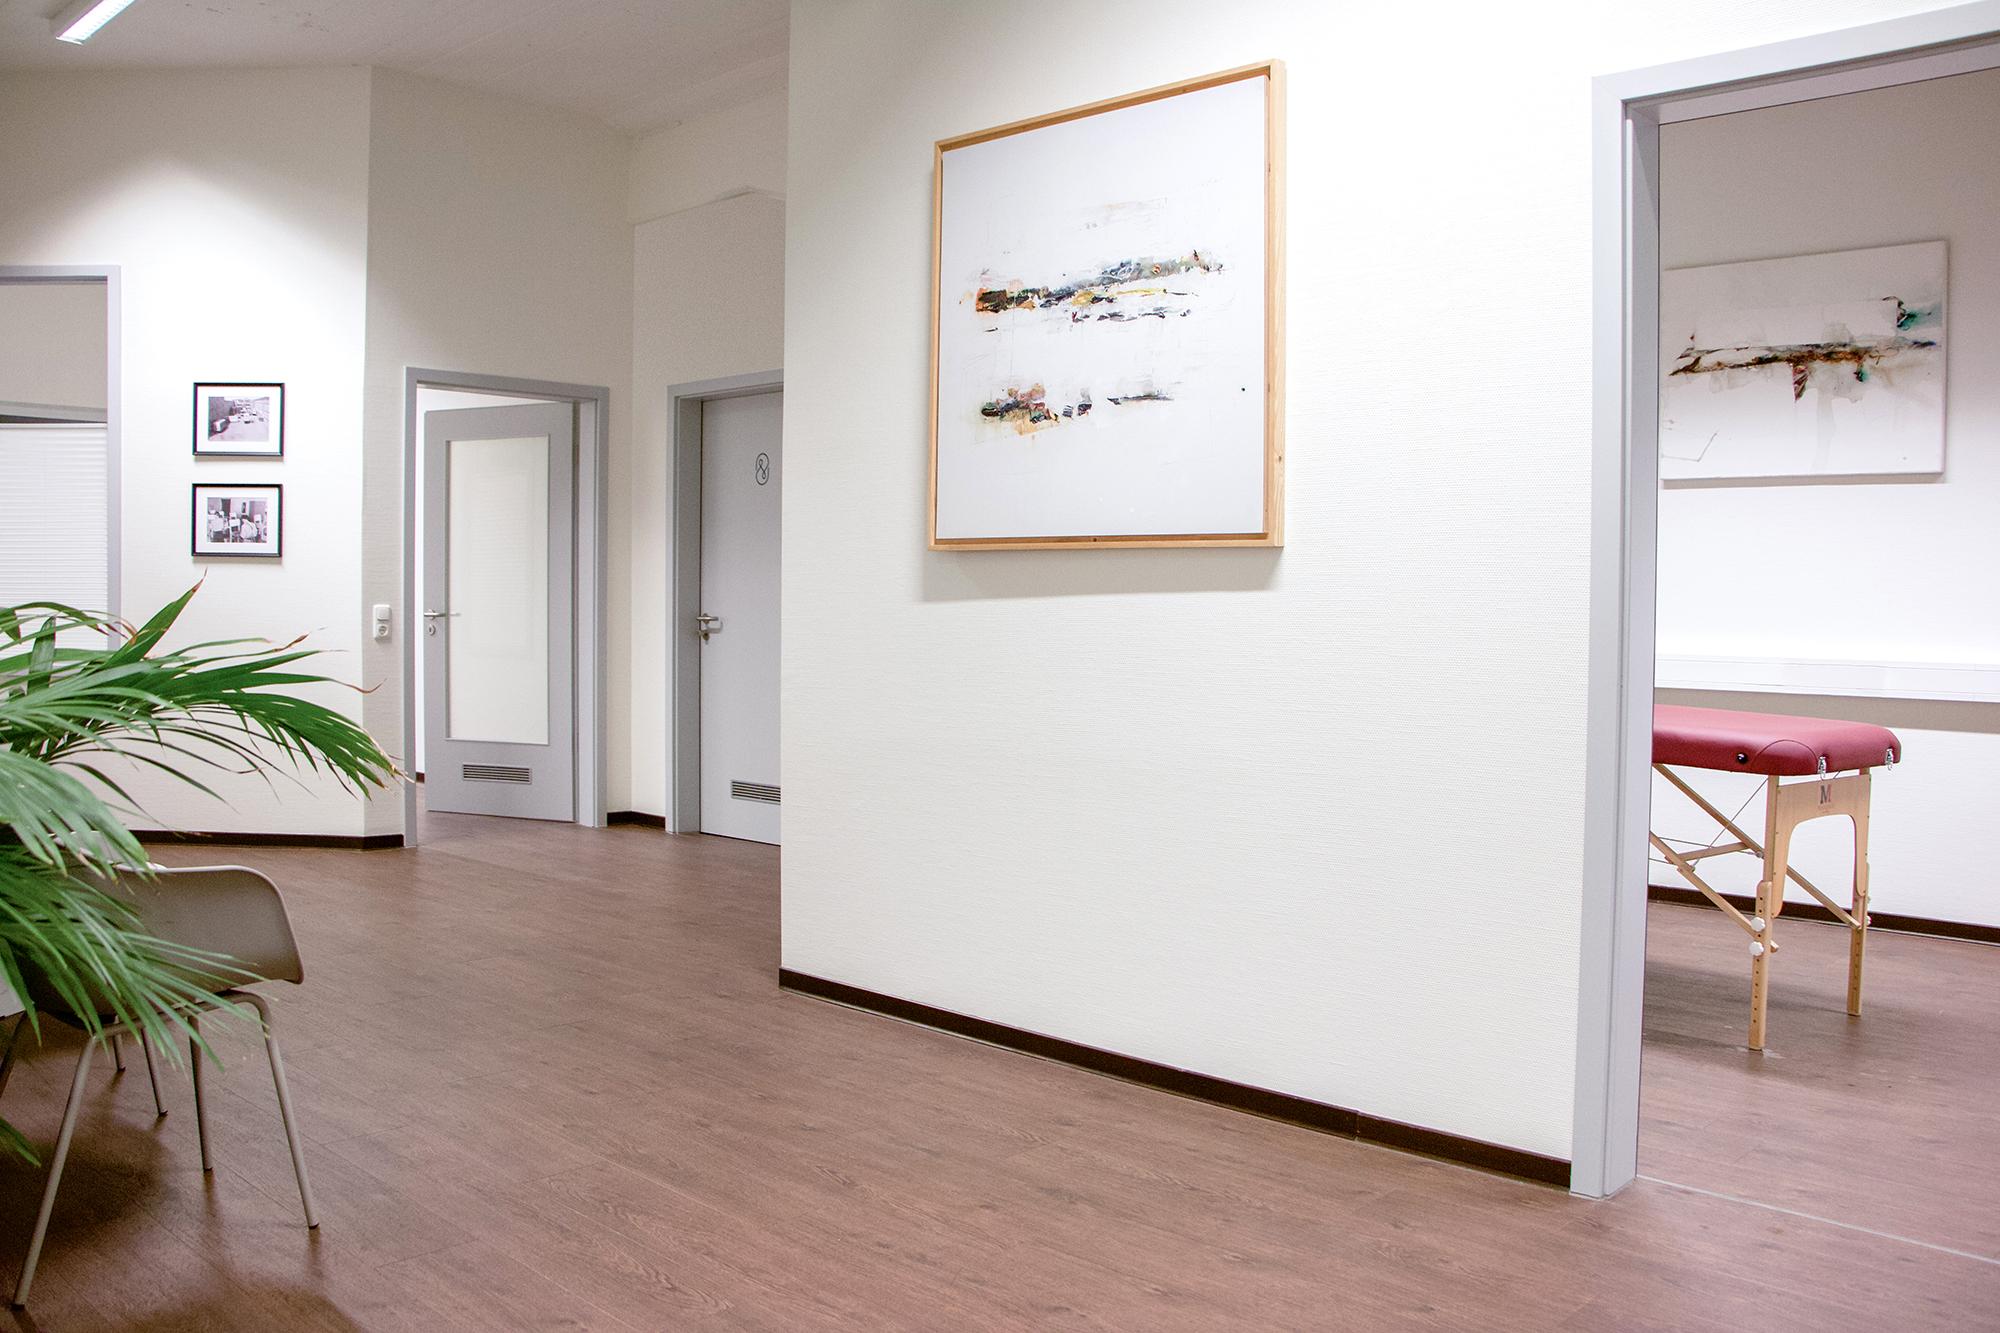 Hennings-Physio-Praxisräume-Studio-Fondo